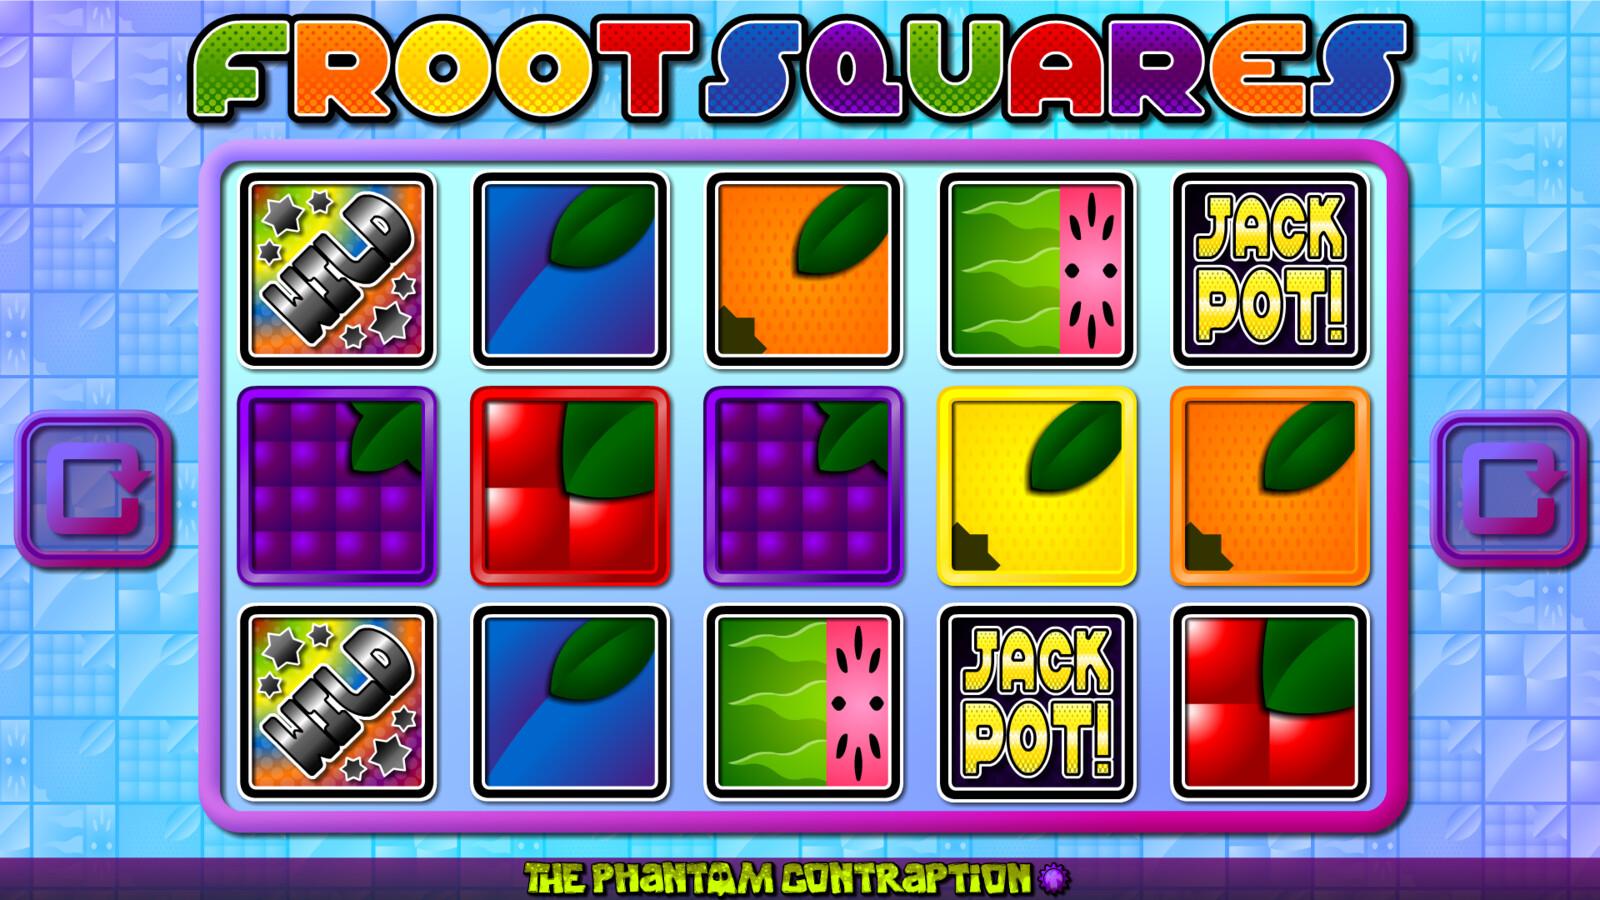 Froot Squares Landscape Screenshot: No Win